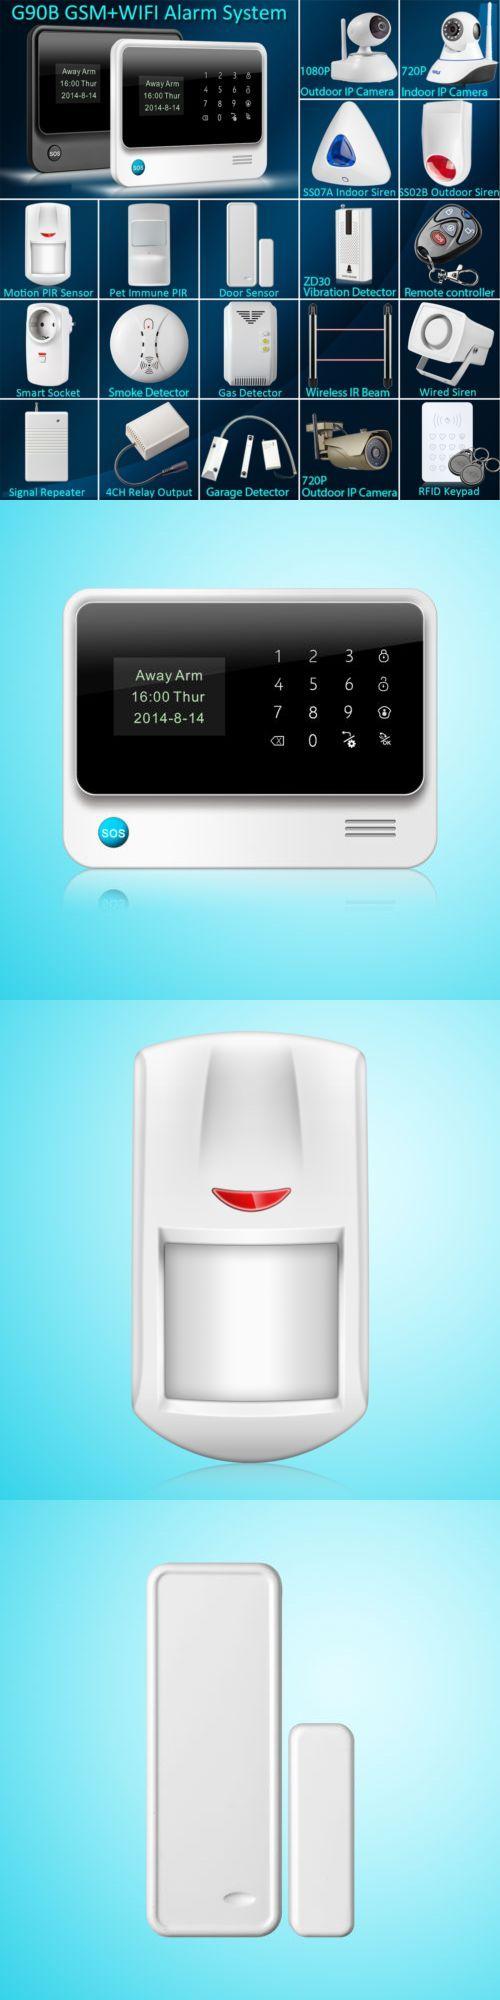 Security Systems 41969: G90b Wifi Gsm Wireless Home Intruder Burglar ...